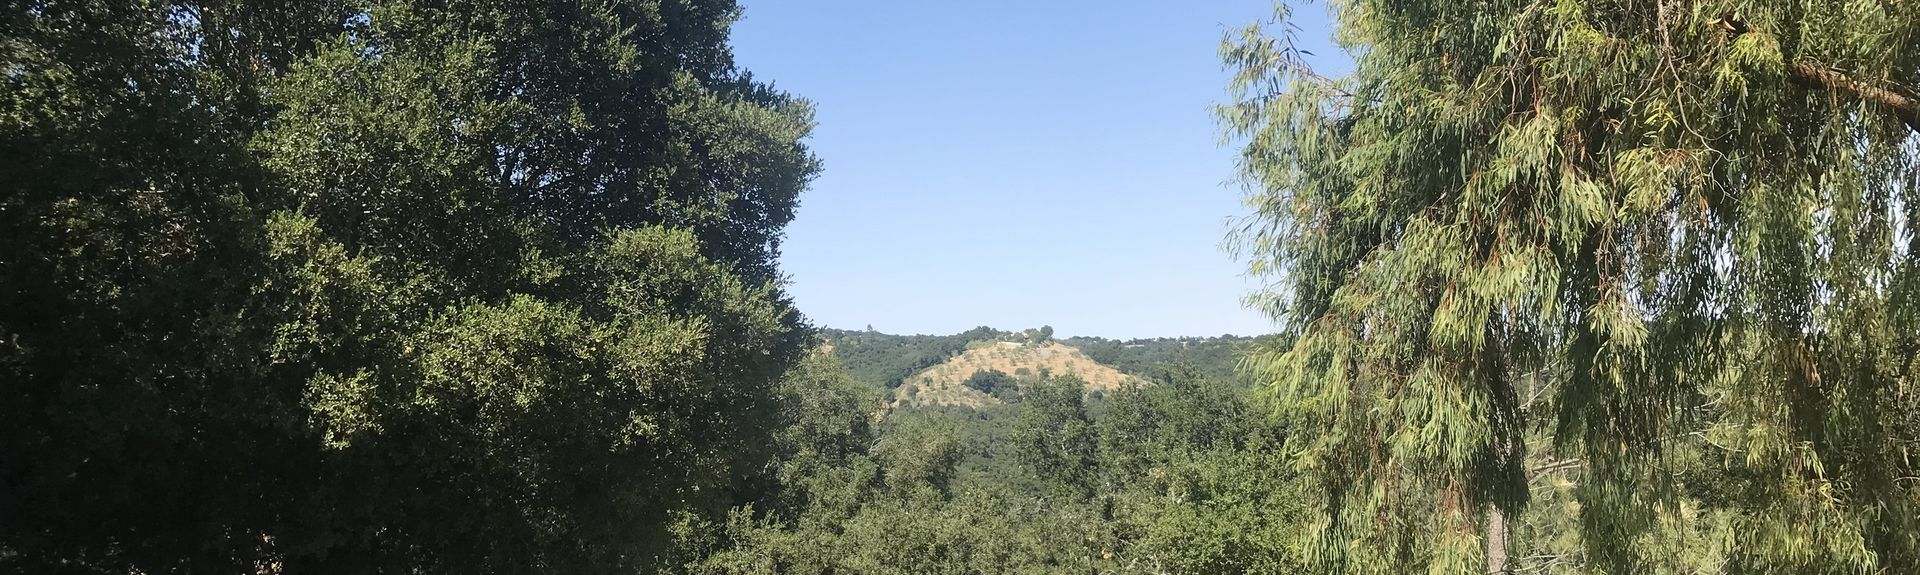 El Chorro Regional Park, San Luis Obispo, Californië, Verenigde Staten